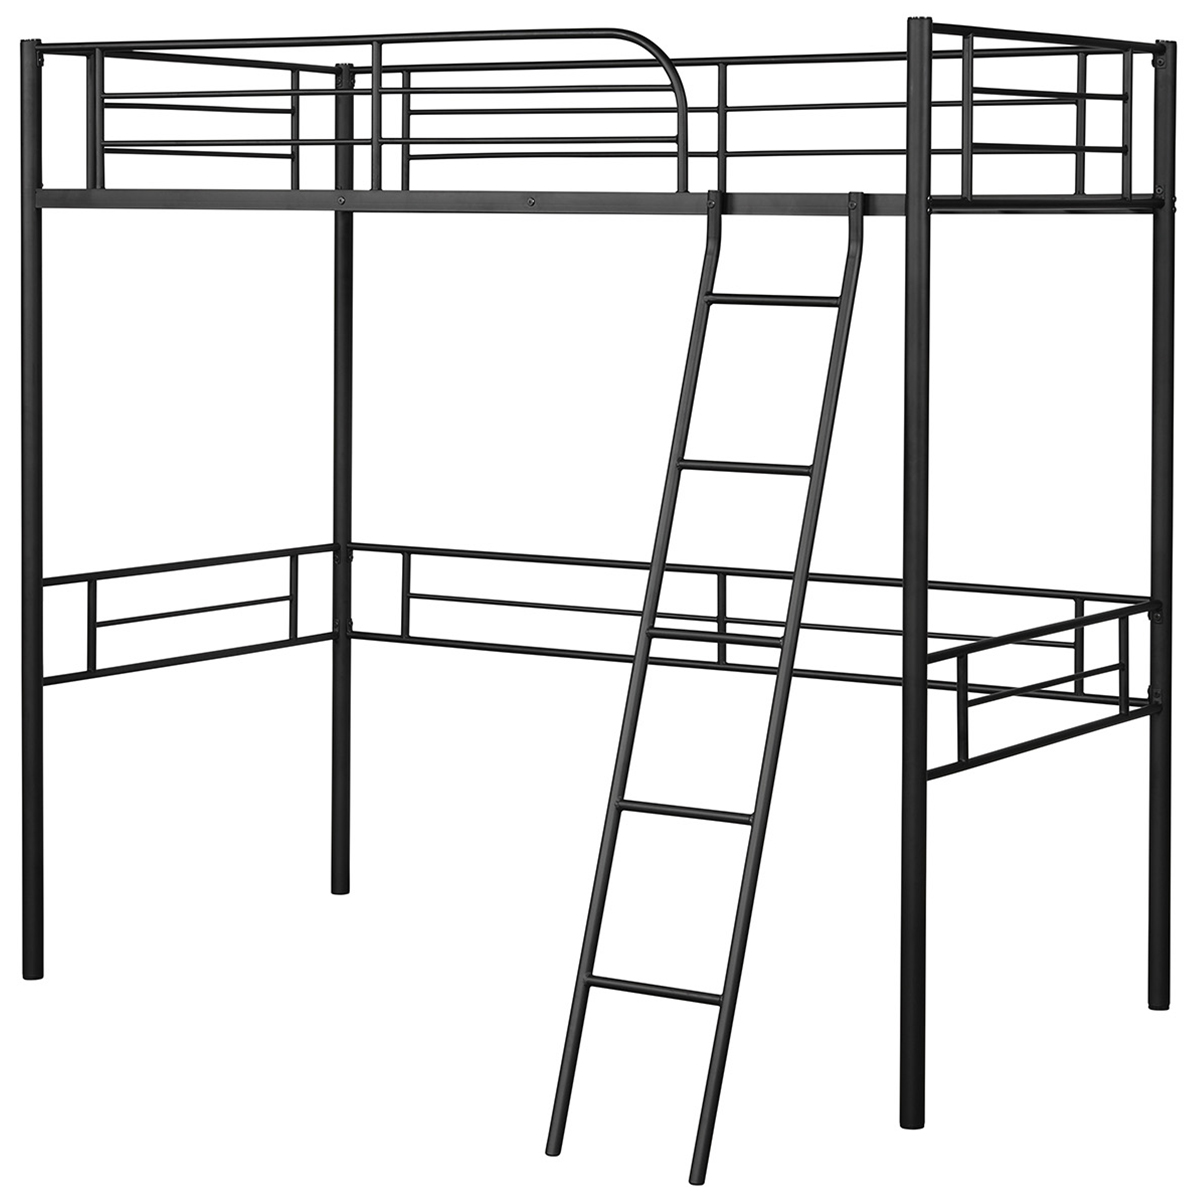 Costway Metal Loft Twin Bed Frame Single Twin Size High Loft Bed W/ Ladder & Guard Rail